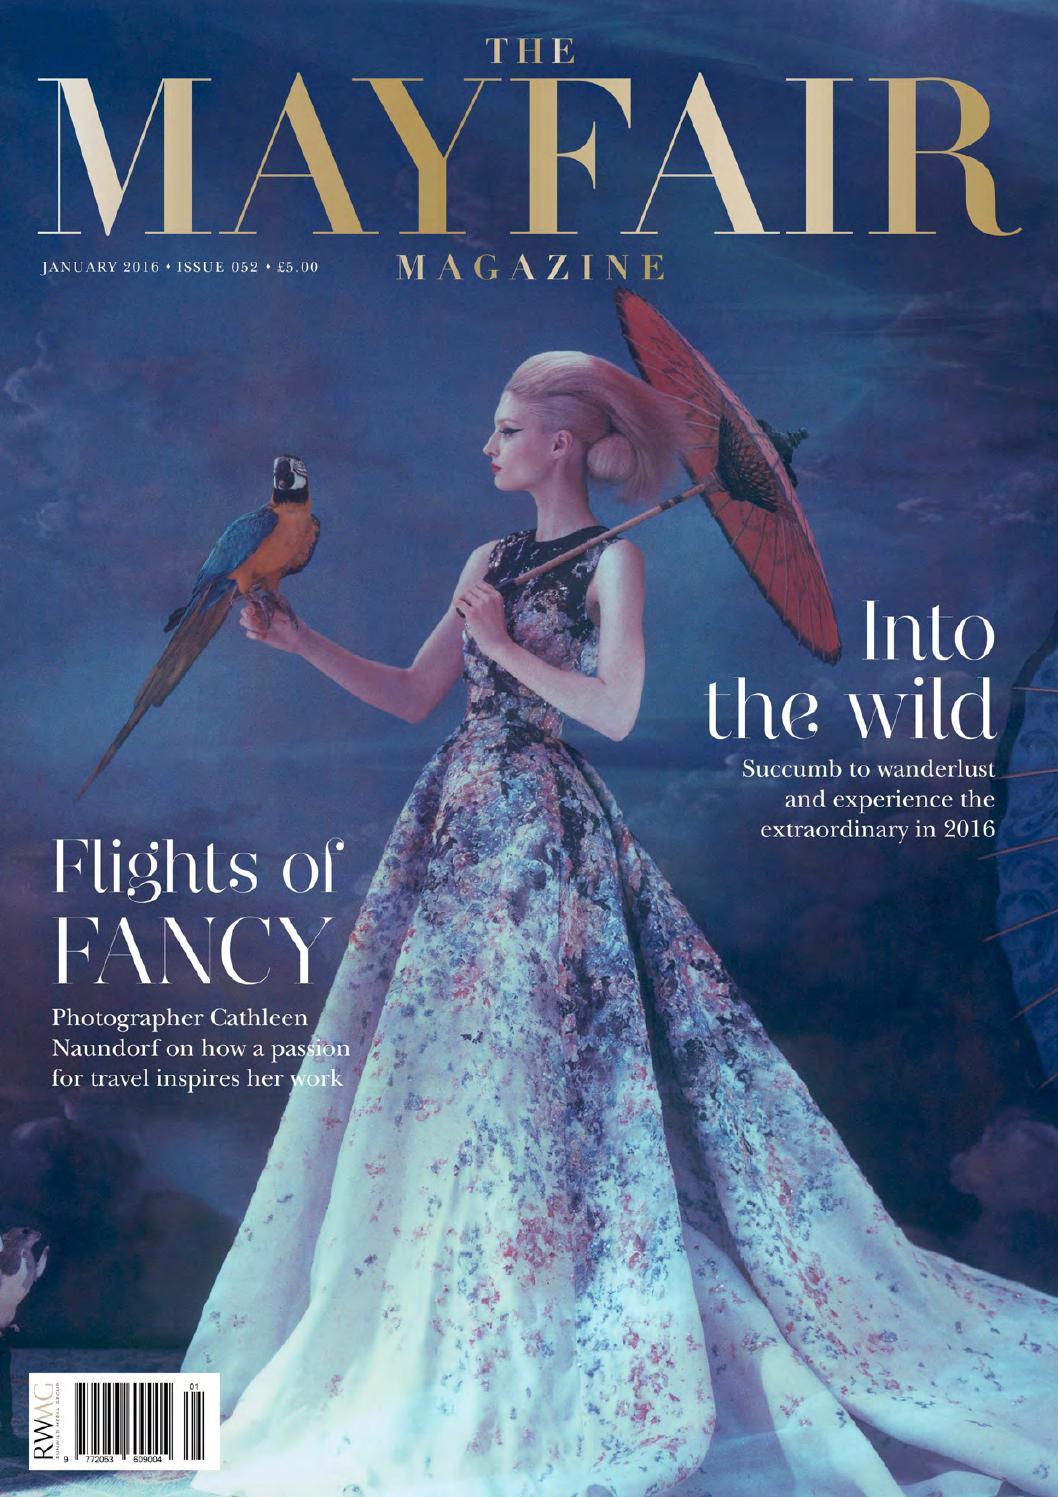 The Mayfair Magazine January 2016 By Runwild Media Group